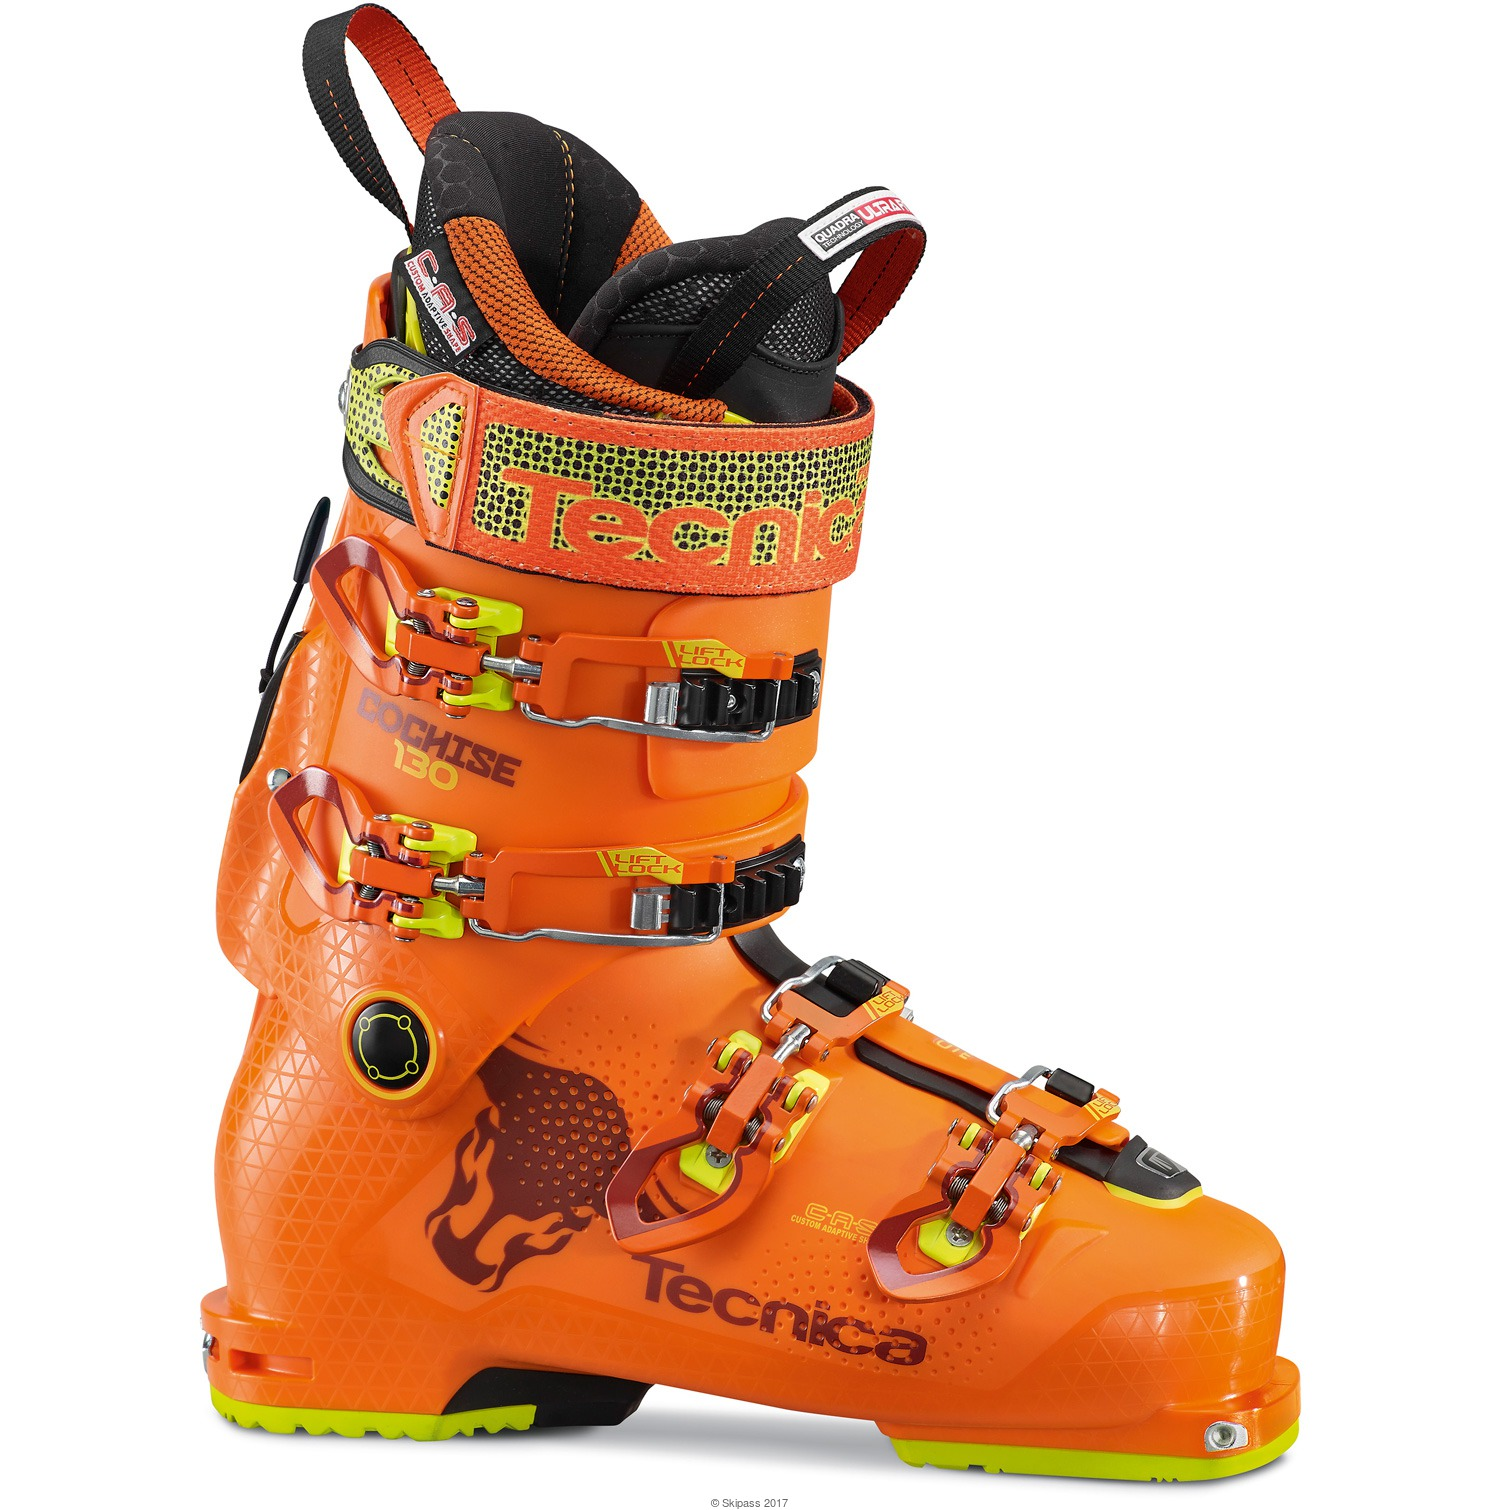 Chaussures de ski Tecnica : avis, test, chaussures ski Tecnica